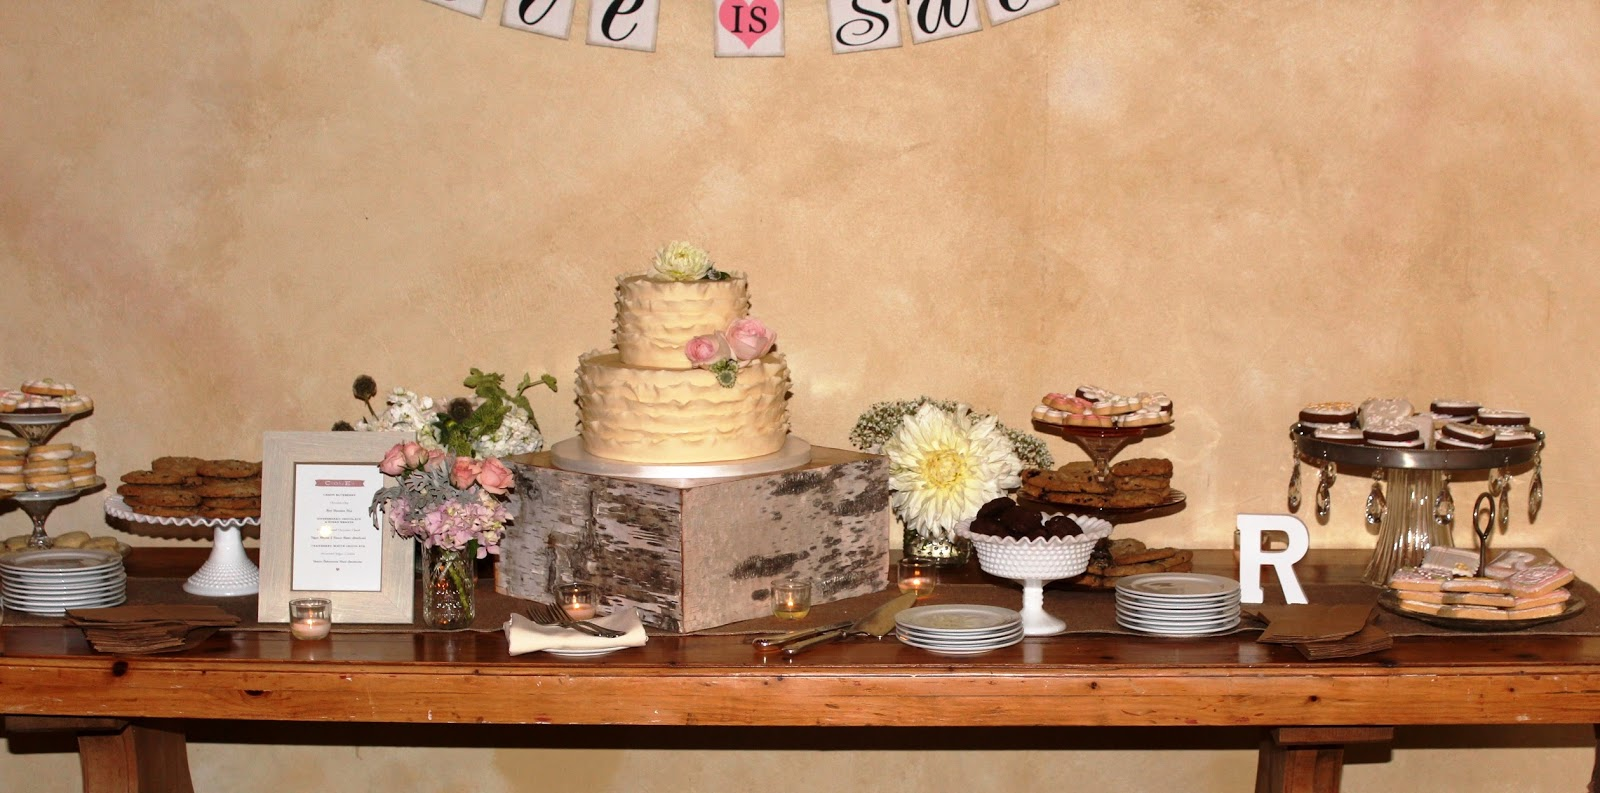 Country Cupboard Cookies Blog: A Wedding Cookie Bar